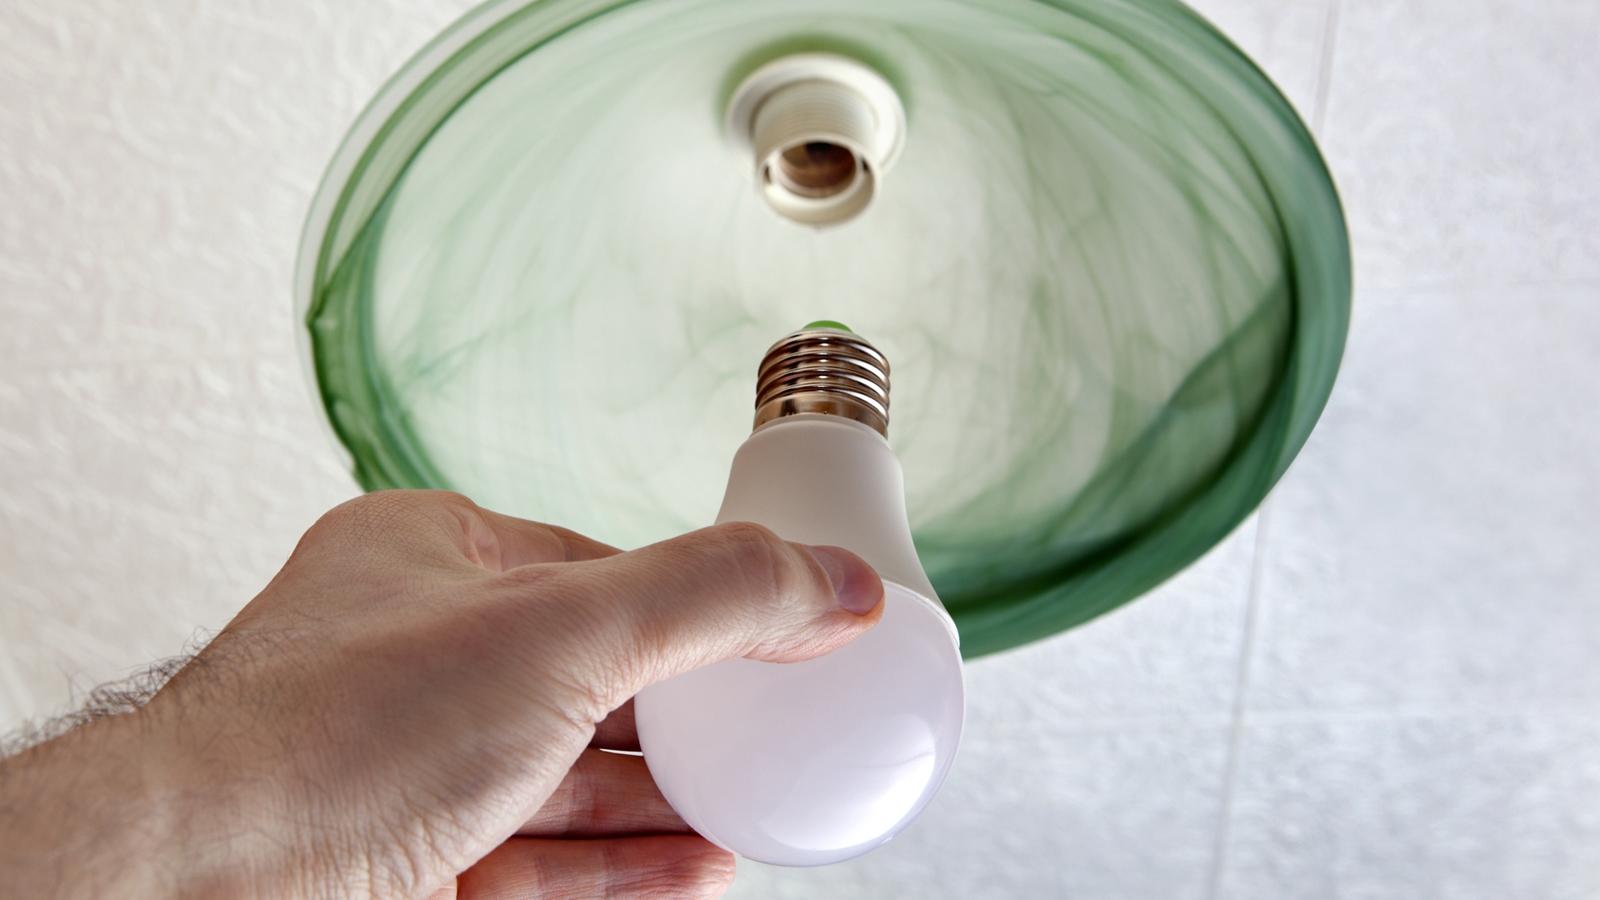 Lampe Flackert Obwohl Schalter Aus